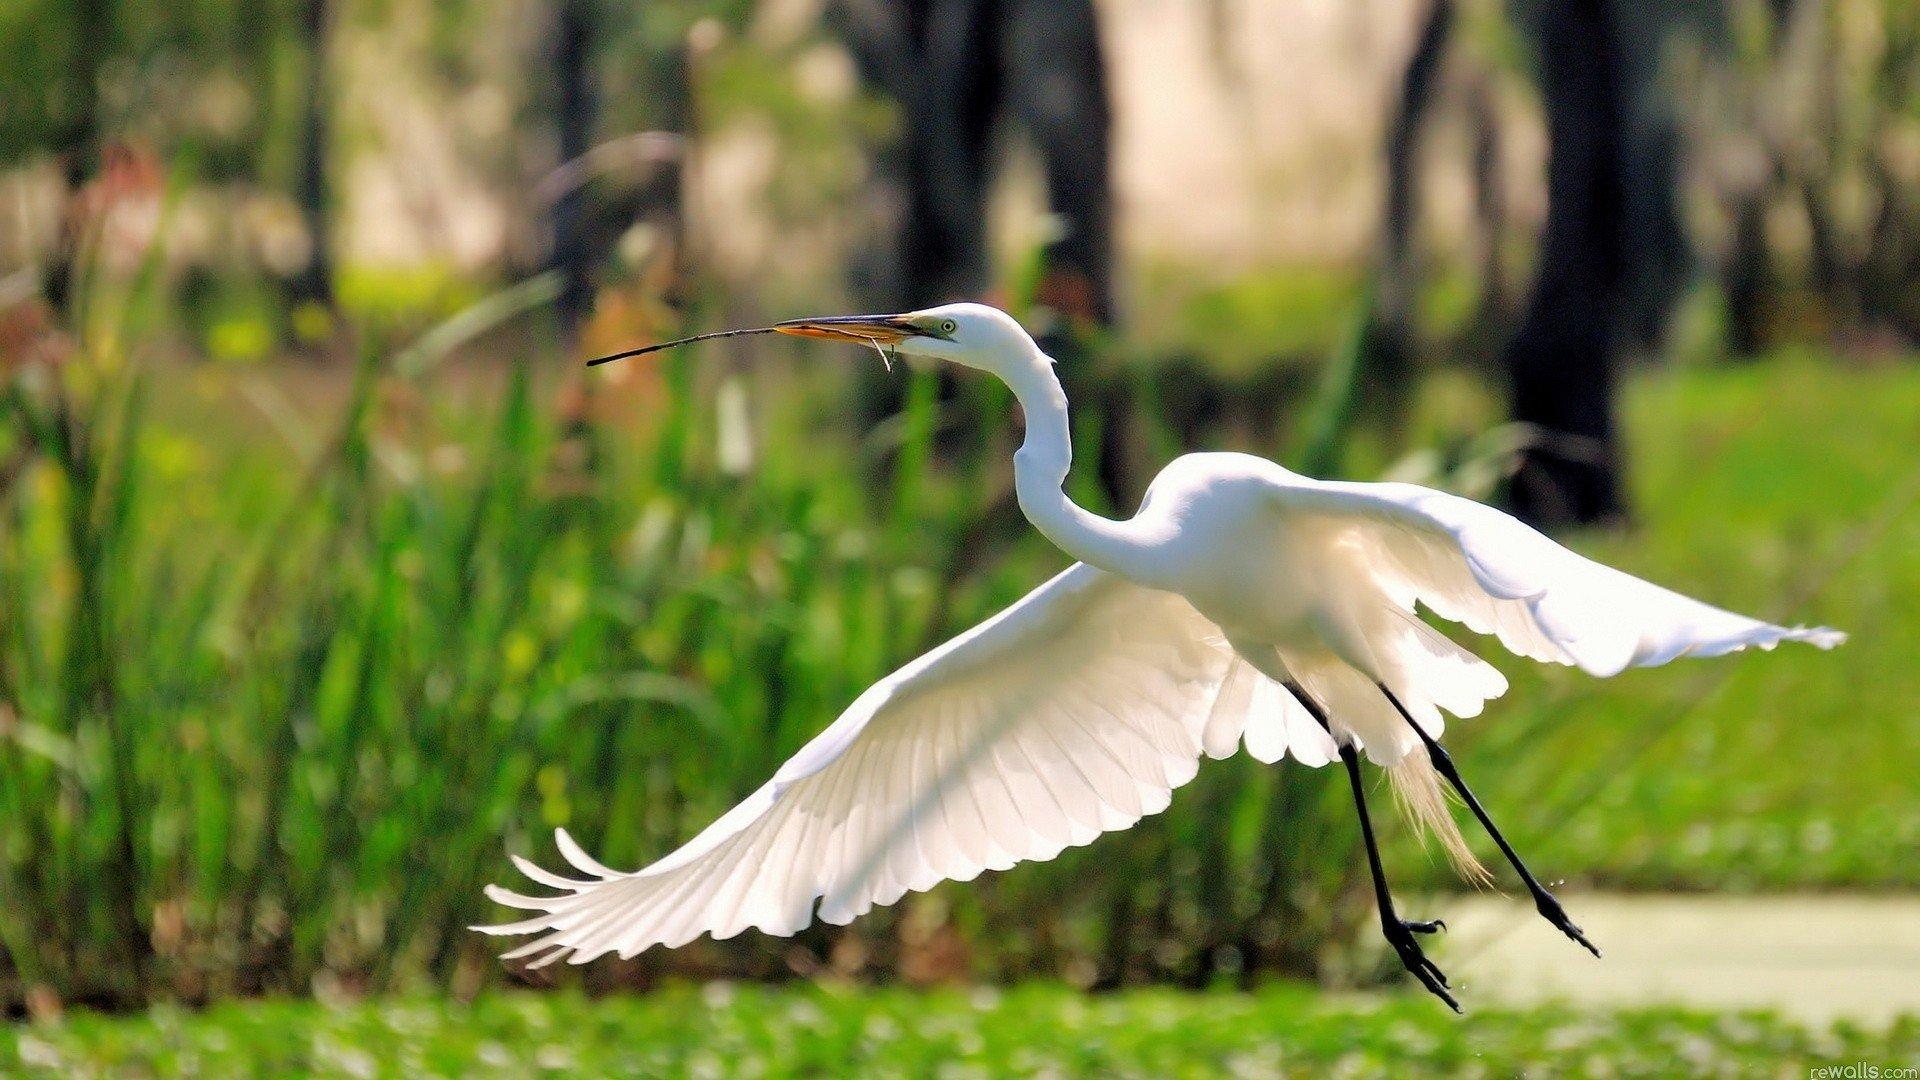 Wallpaper 1920x1080 Px Birds Egret Egrets Flying Great